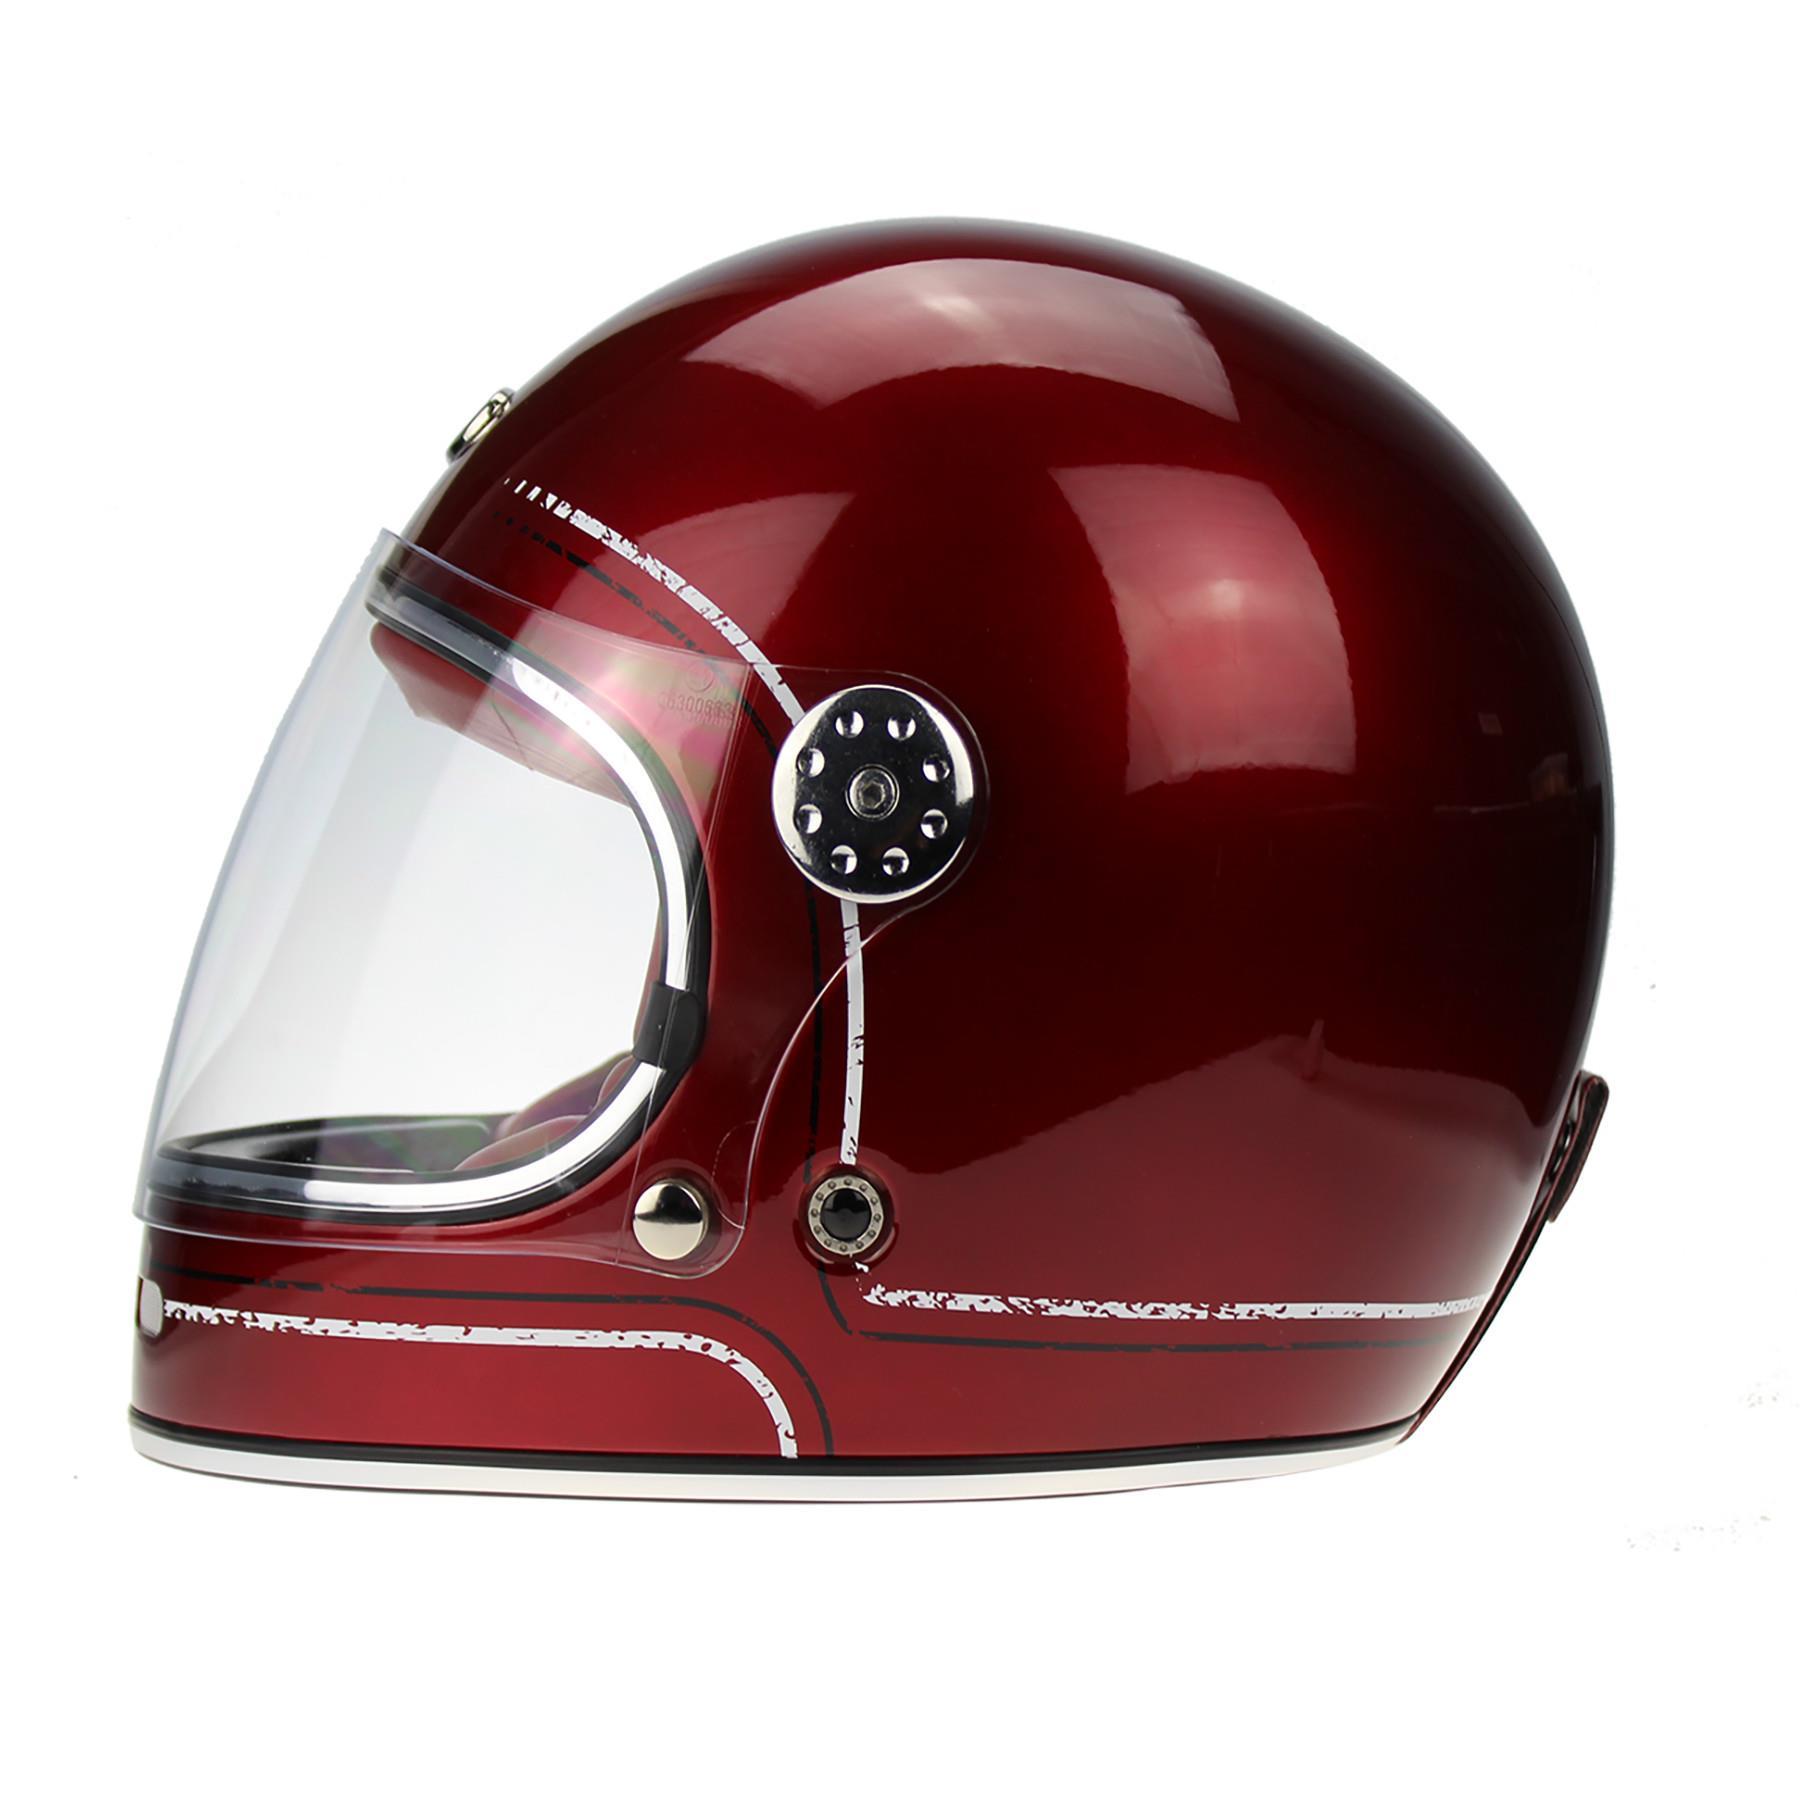 Viper-F656-Retro-Vintage-FibreGlass-Full-Face-Motorcycle-Bike-Road-Crash-Helmet miniature 9